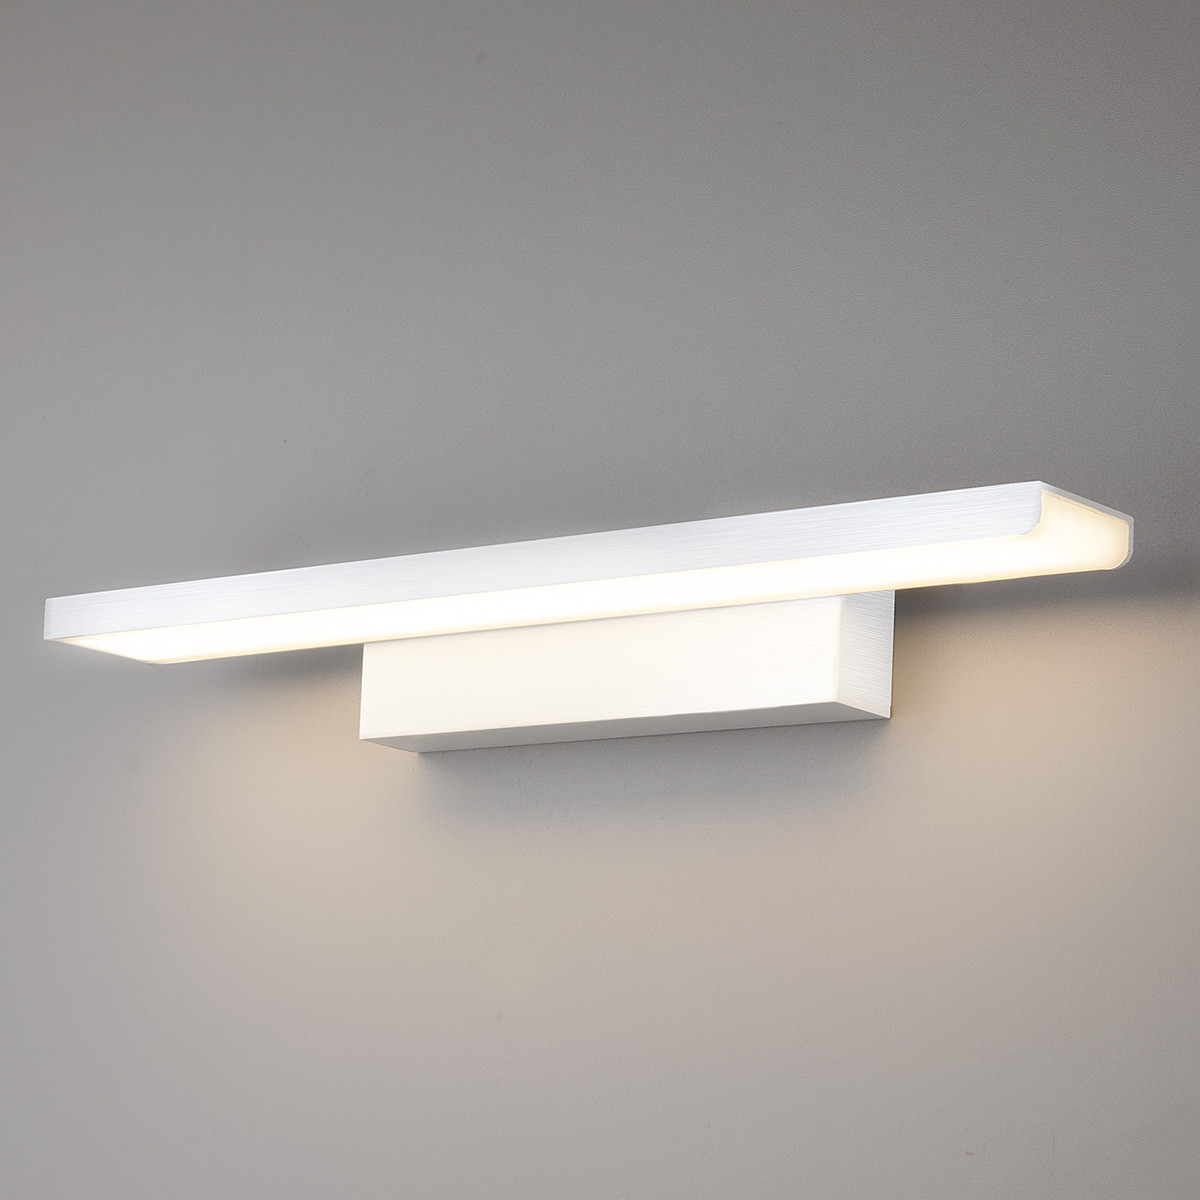 MRL LED 16W 1009 IP20 /Светильник настенный светодиодный Sankara LED белая